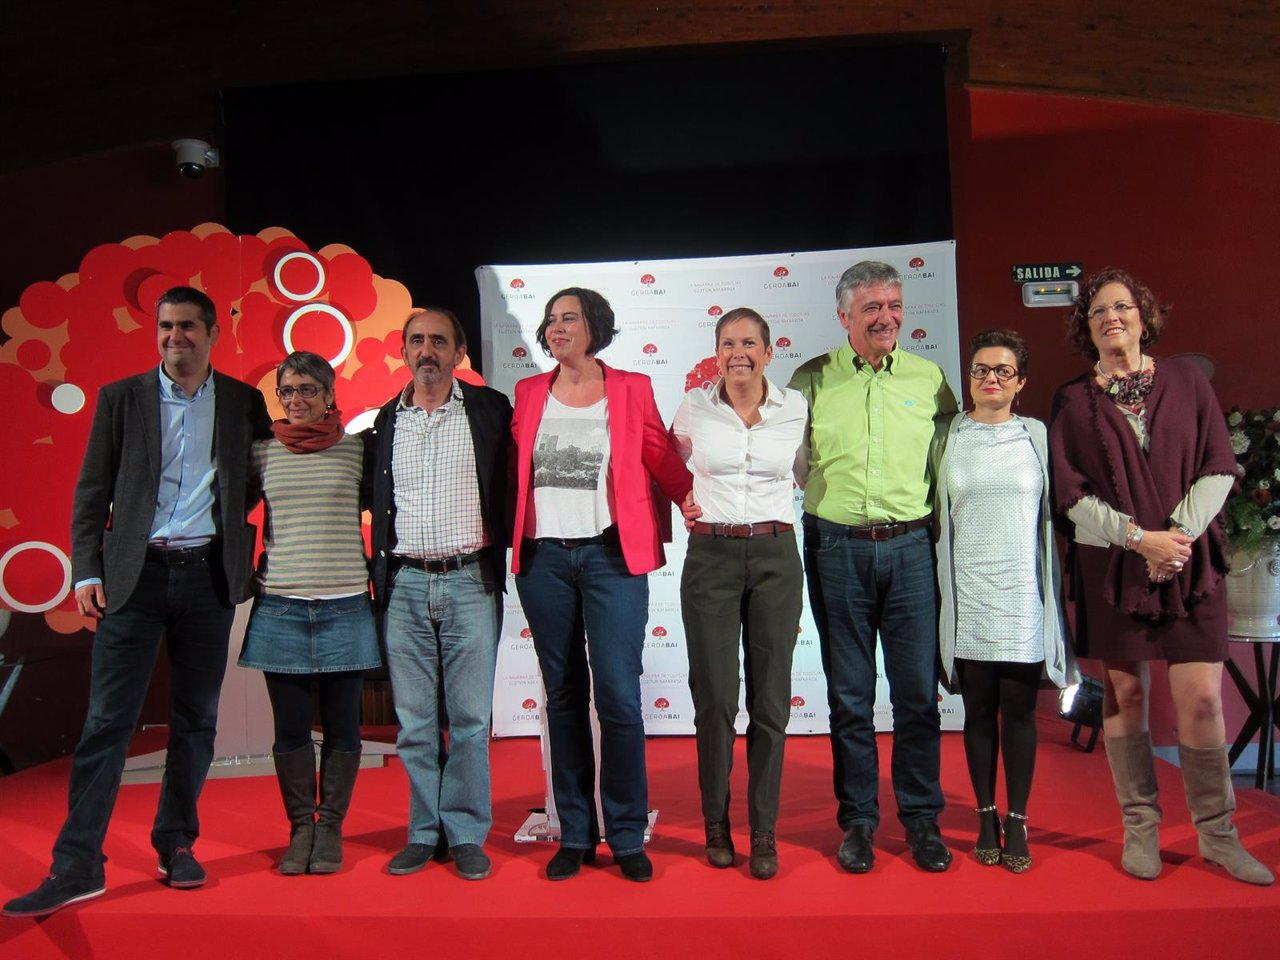 Los candidatos de Geroa Bai junto a Uxue Barkos